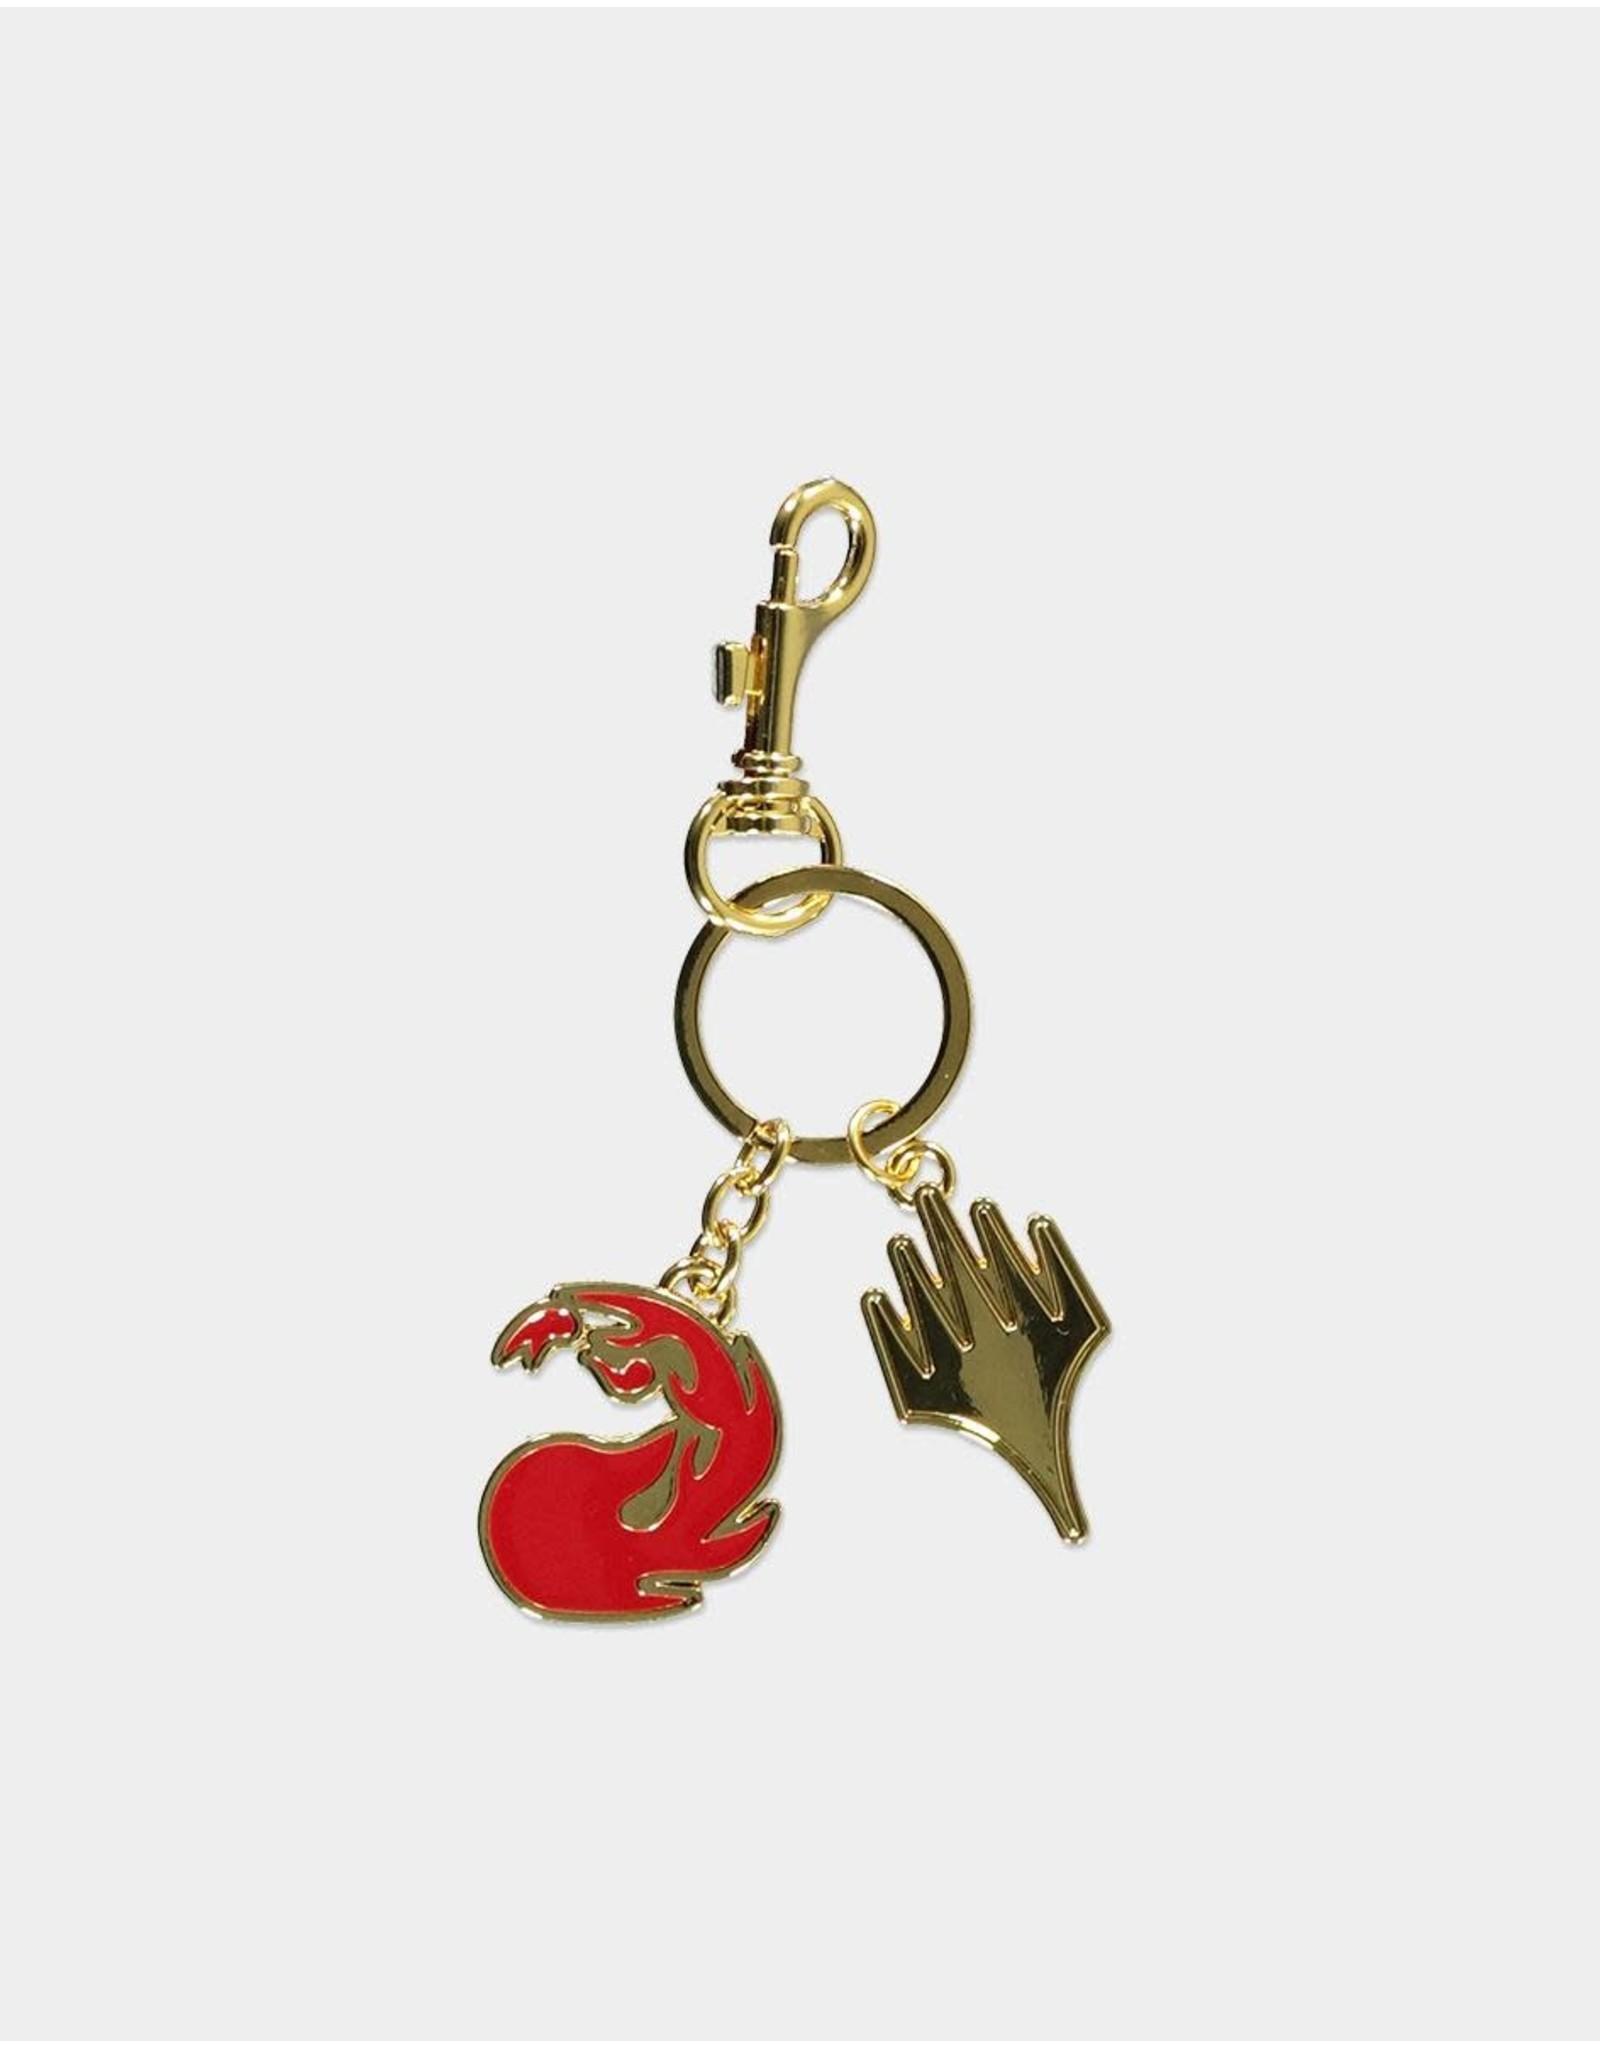 MAGIC THE GATHERING Metal Keychain - Red Mana